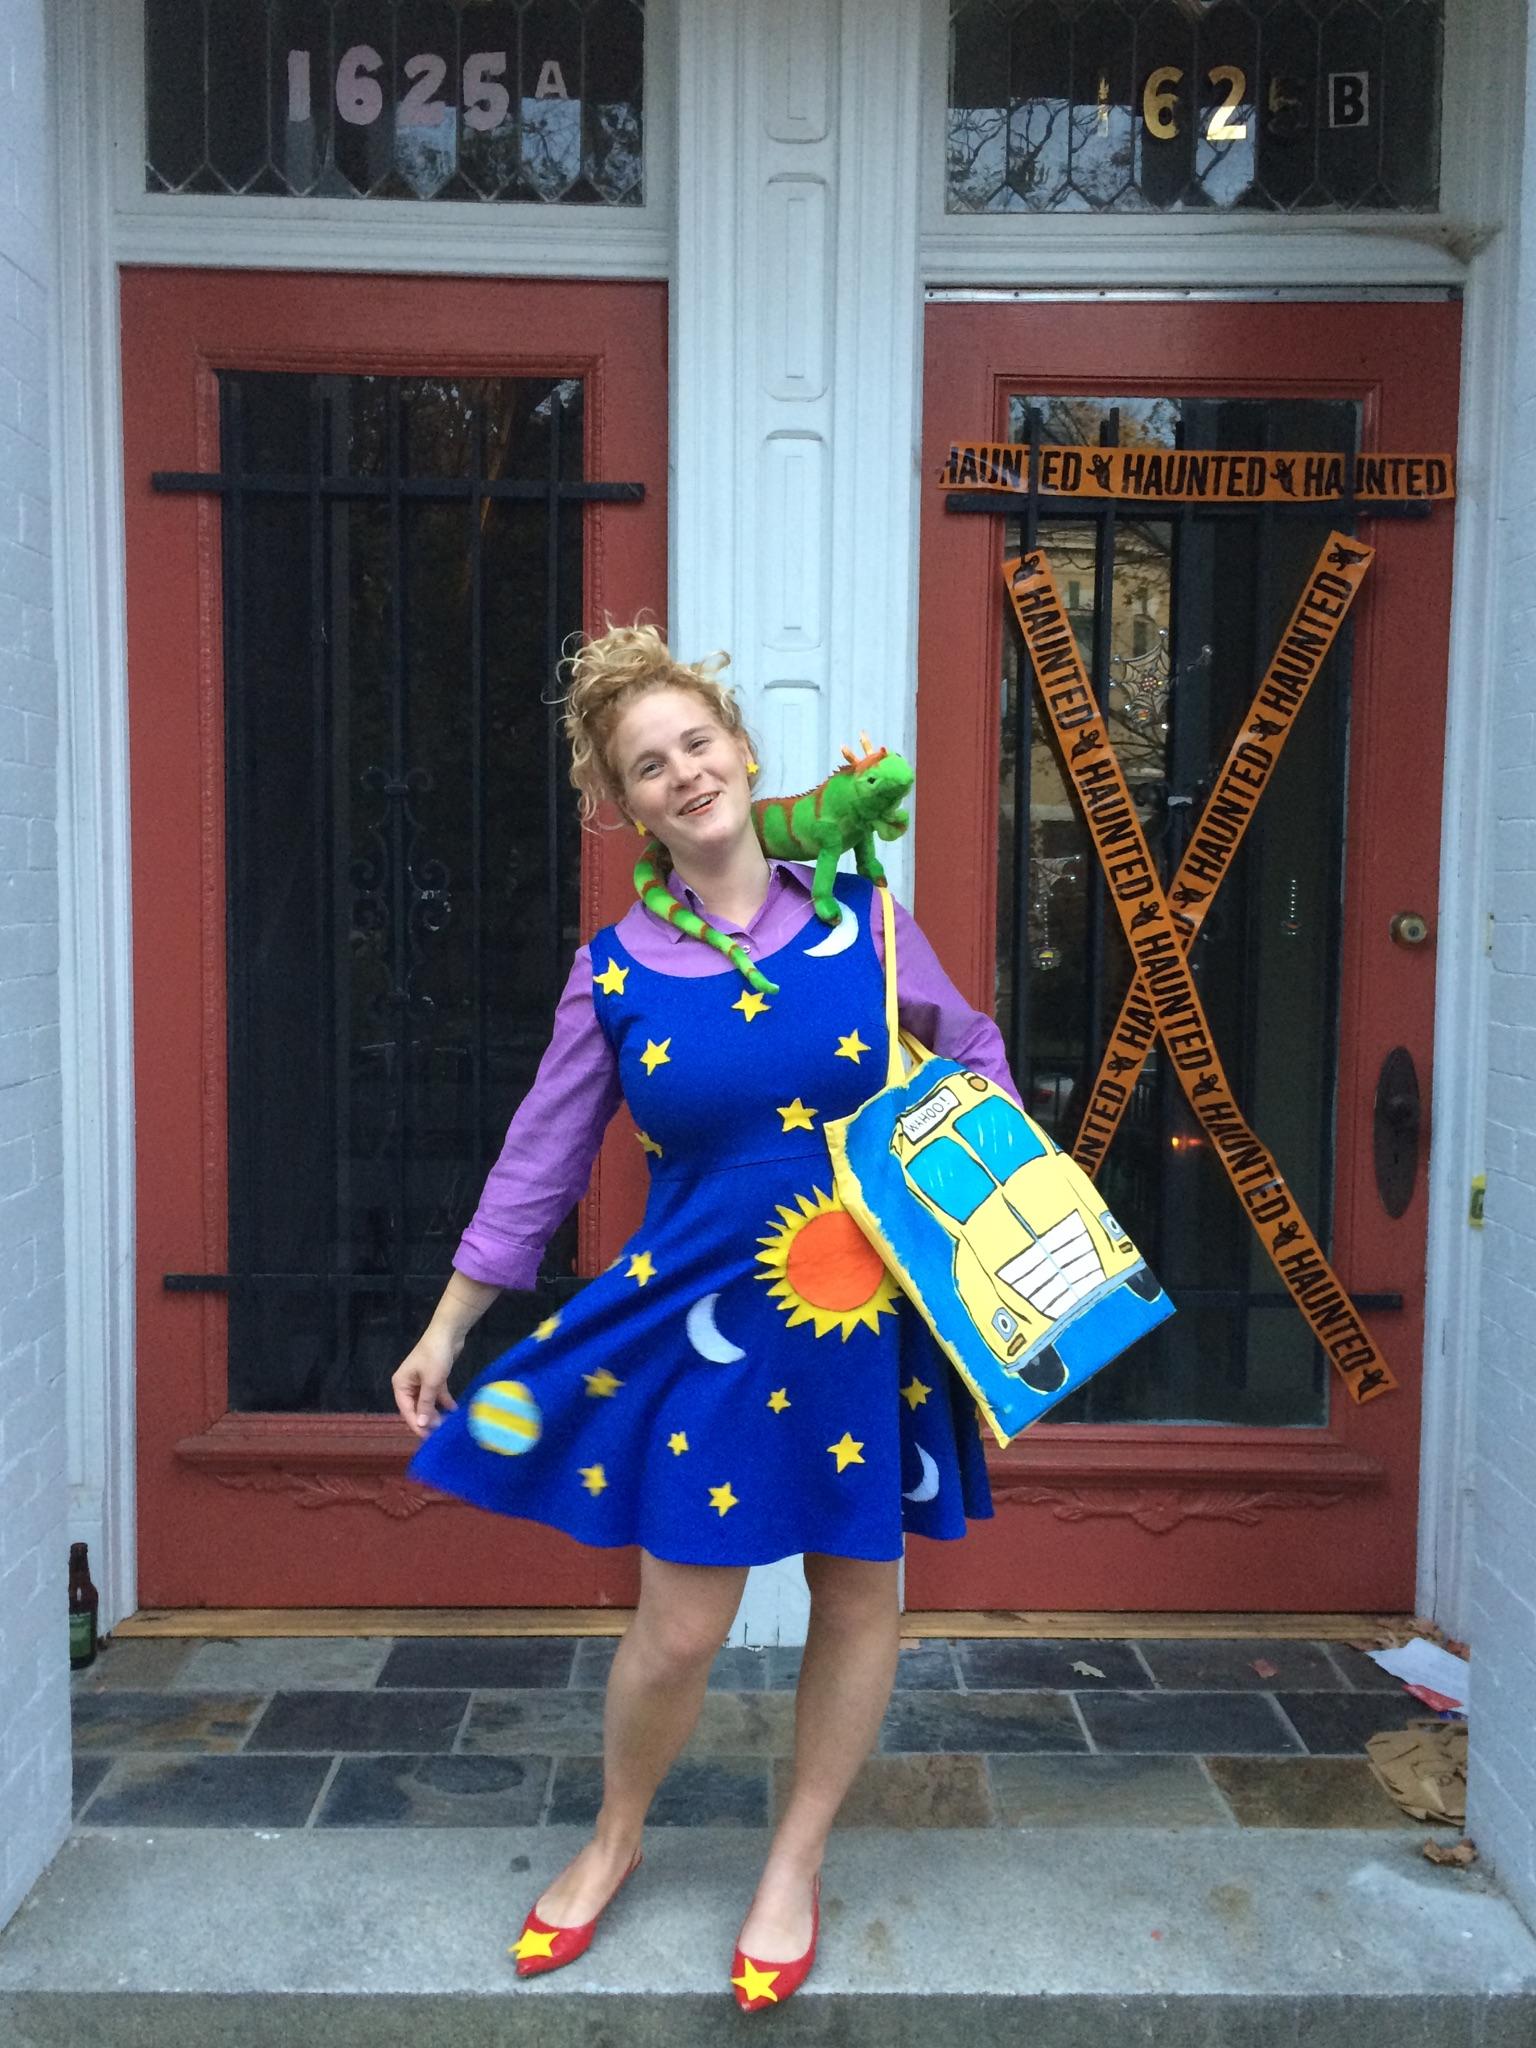 Ms Frizzle Handmade Halloween Costume Micah Baker